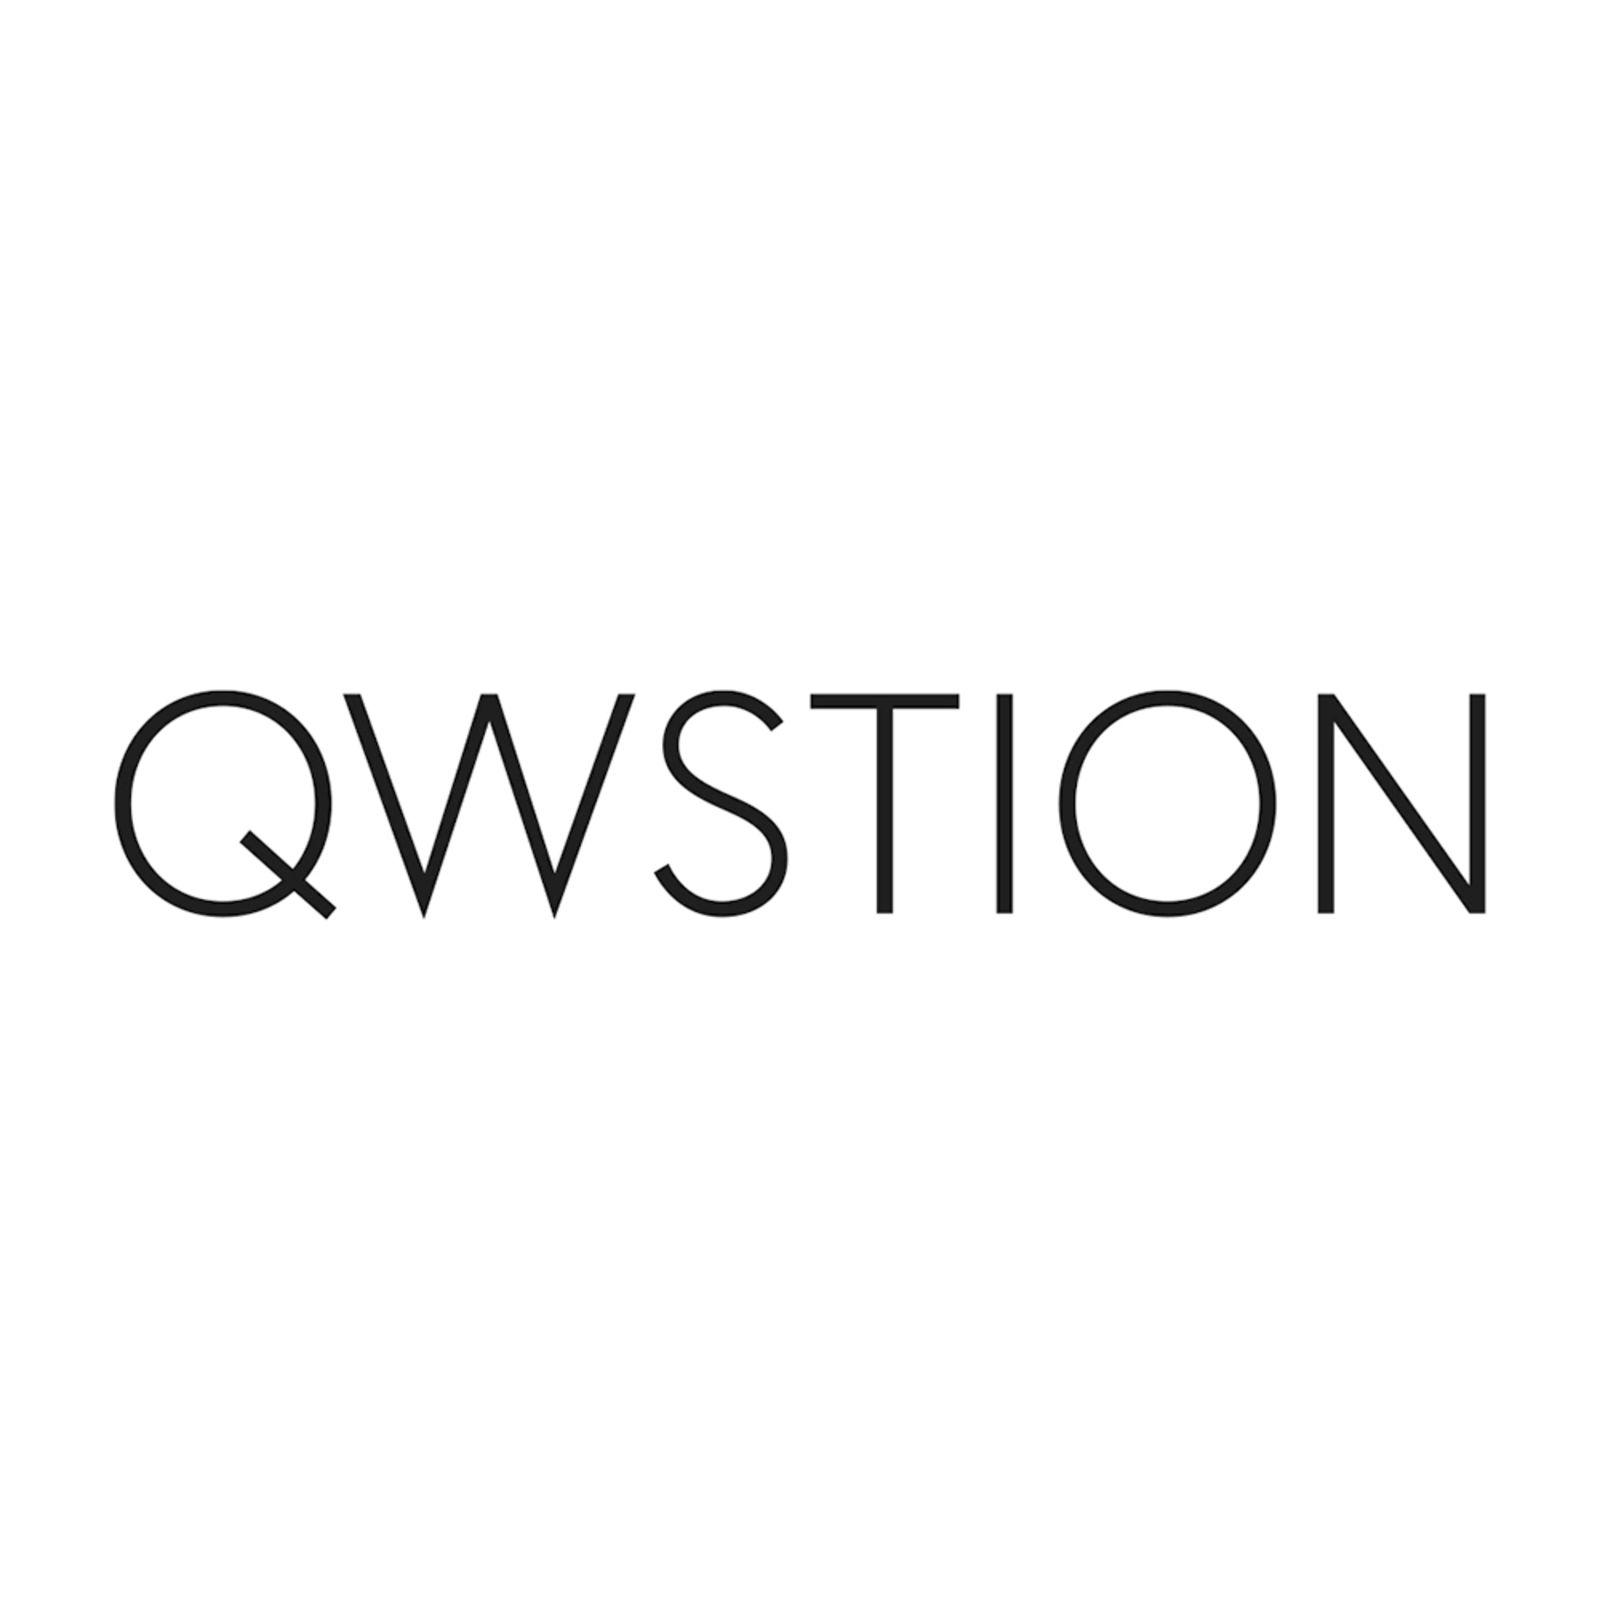 QWSTION (Bild 1)